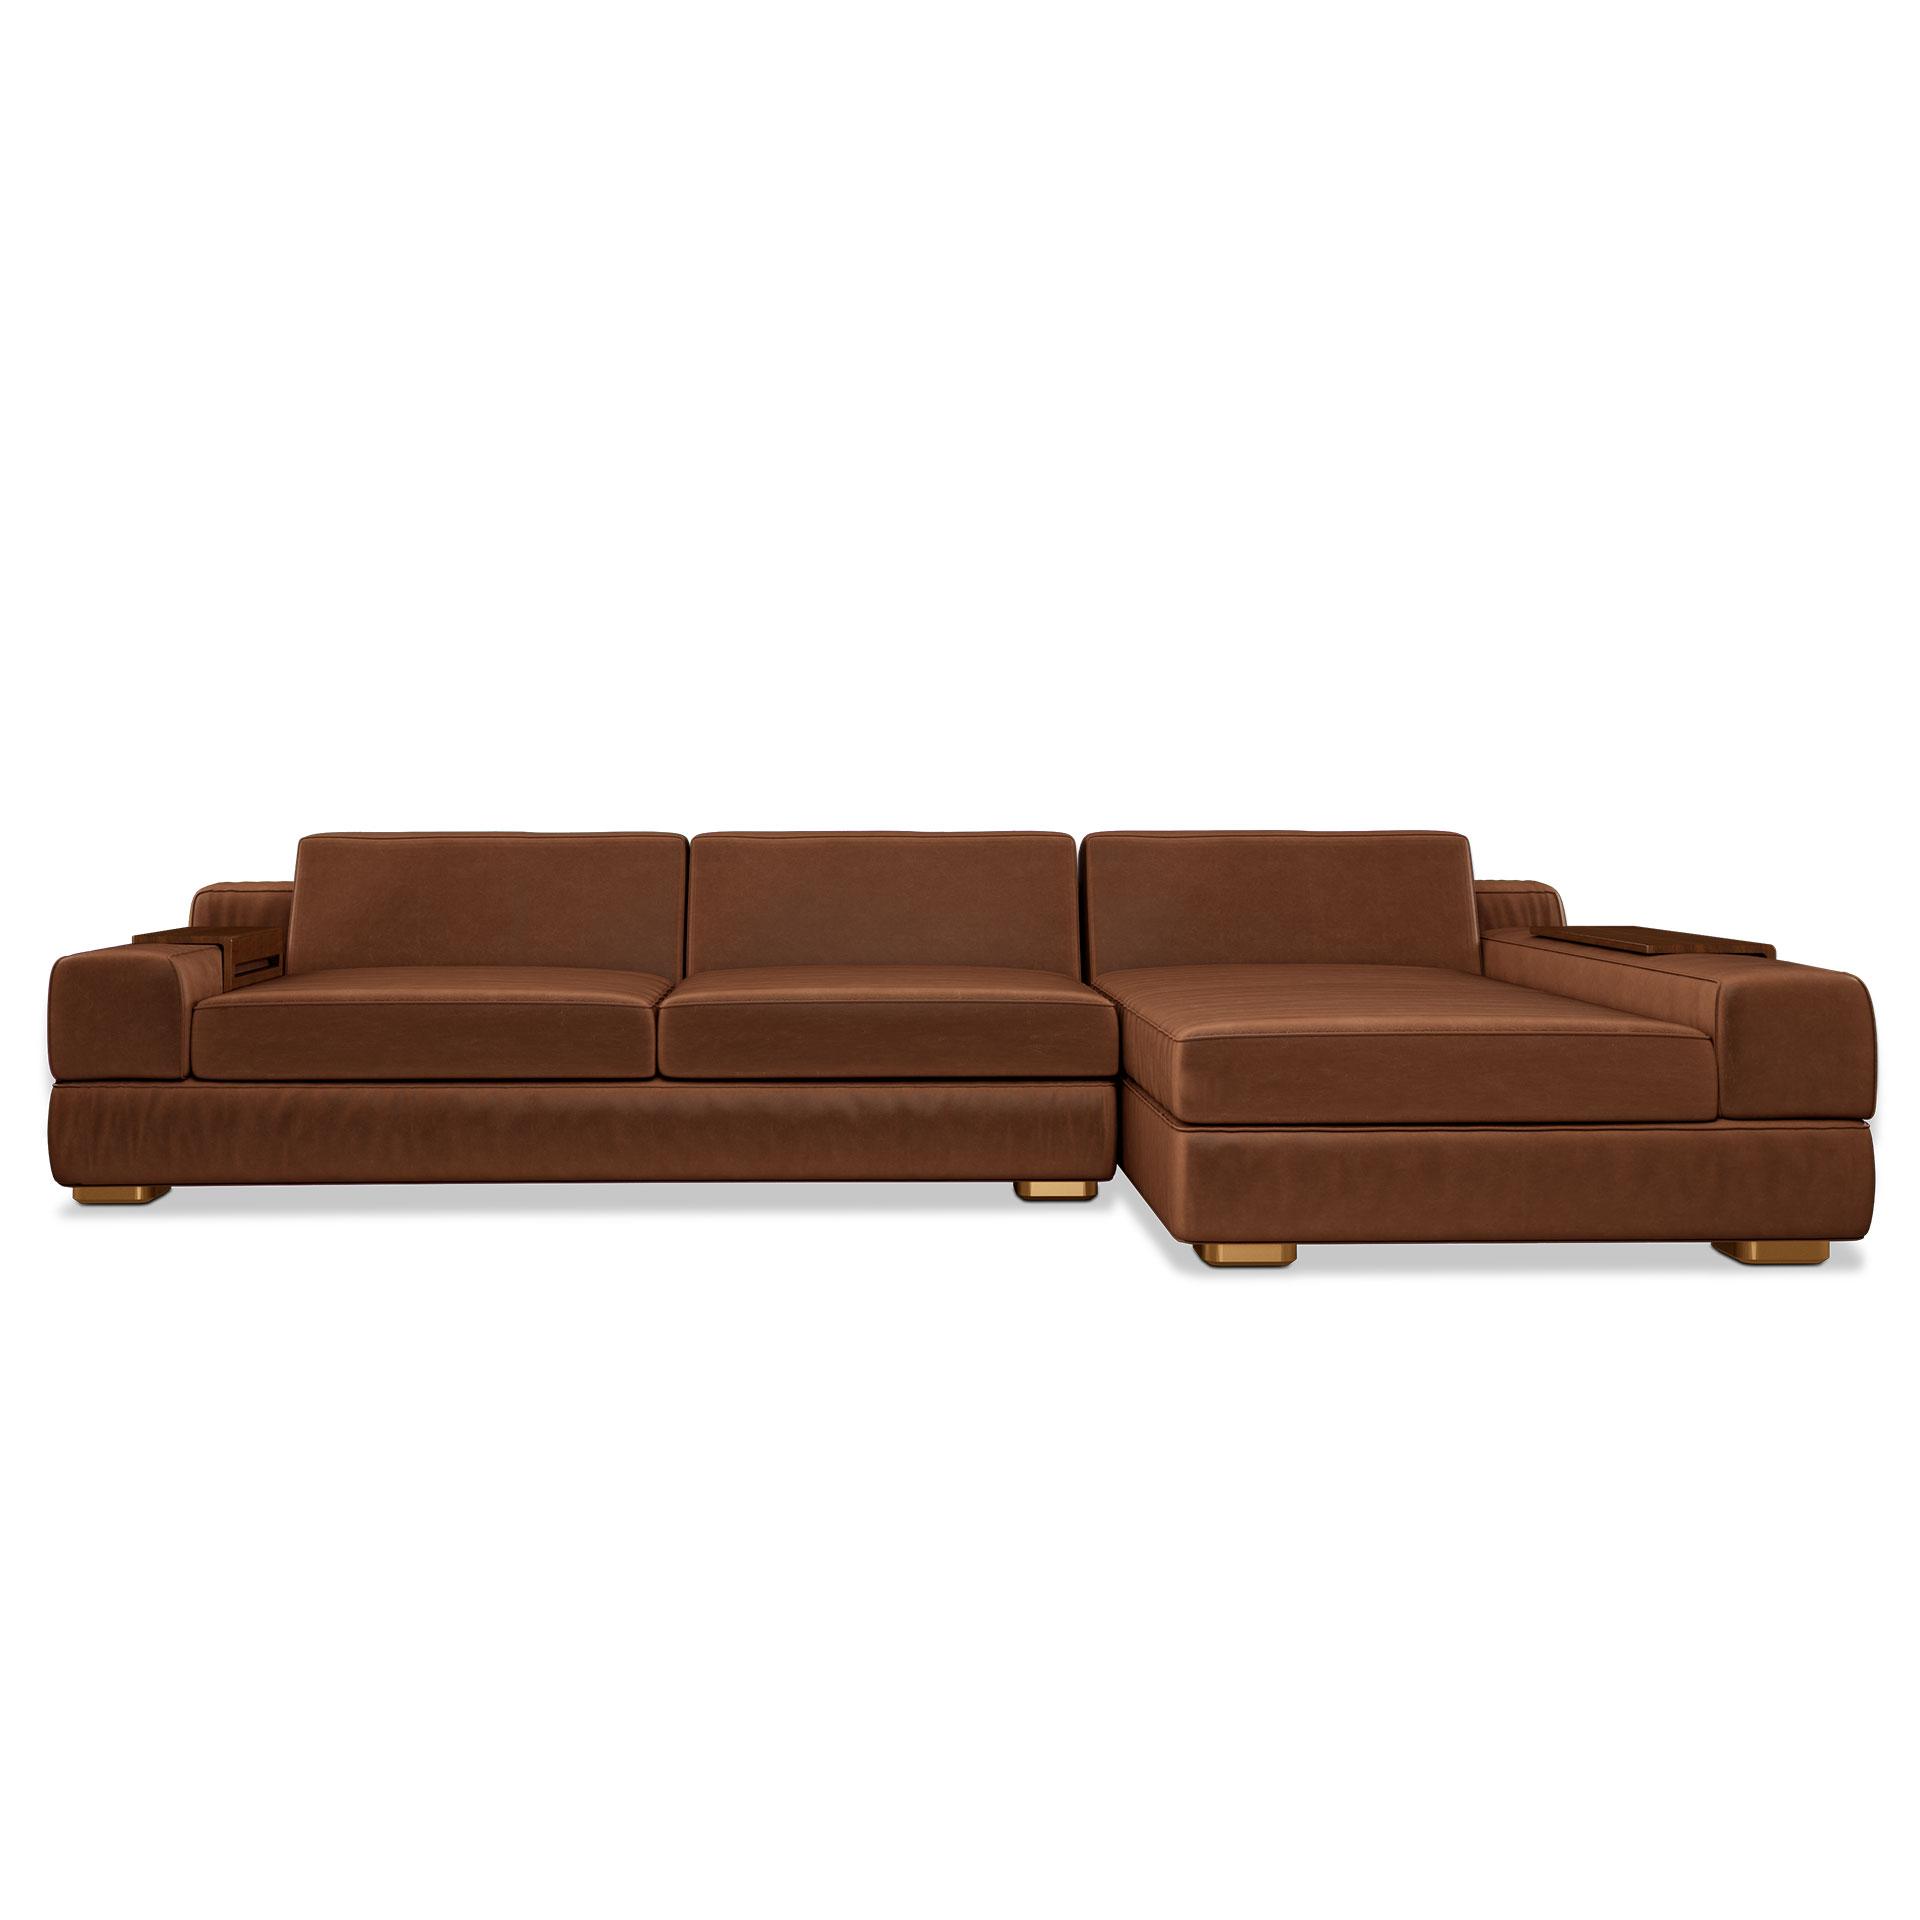 Canyon sofa